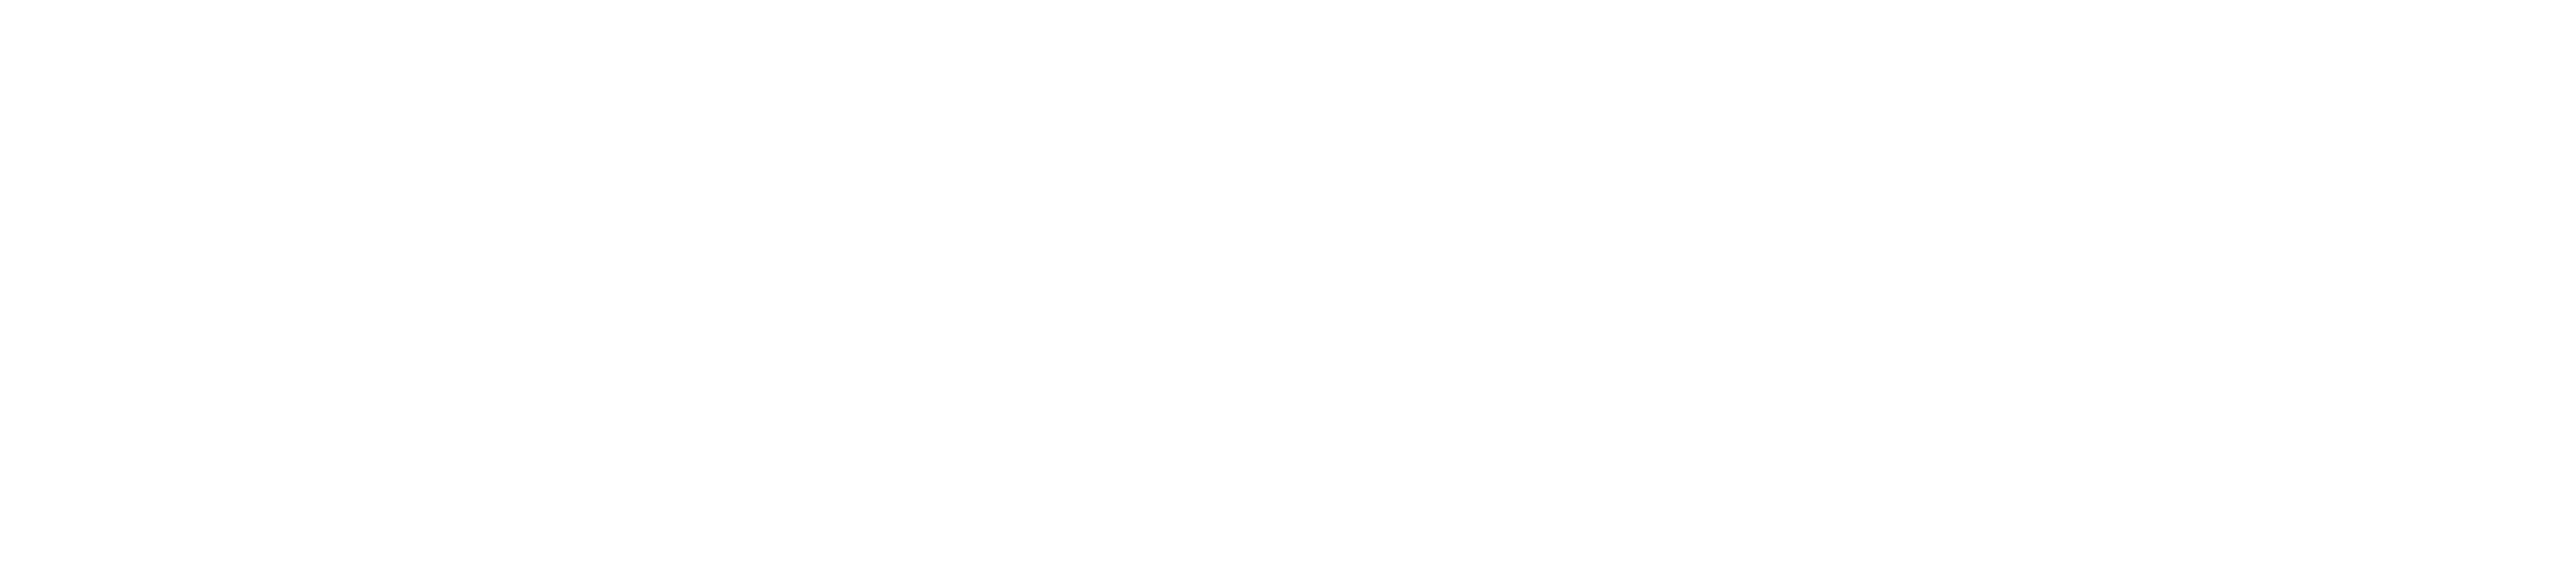 Brasa logo white